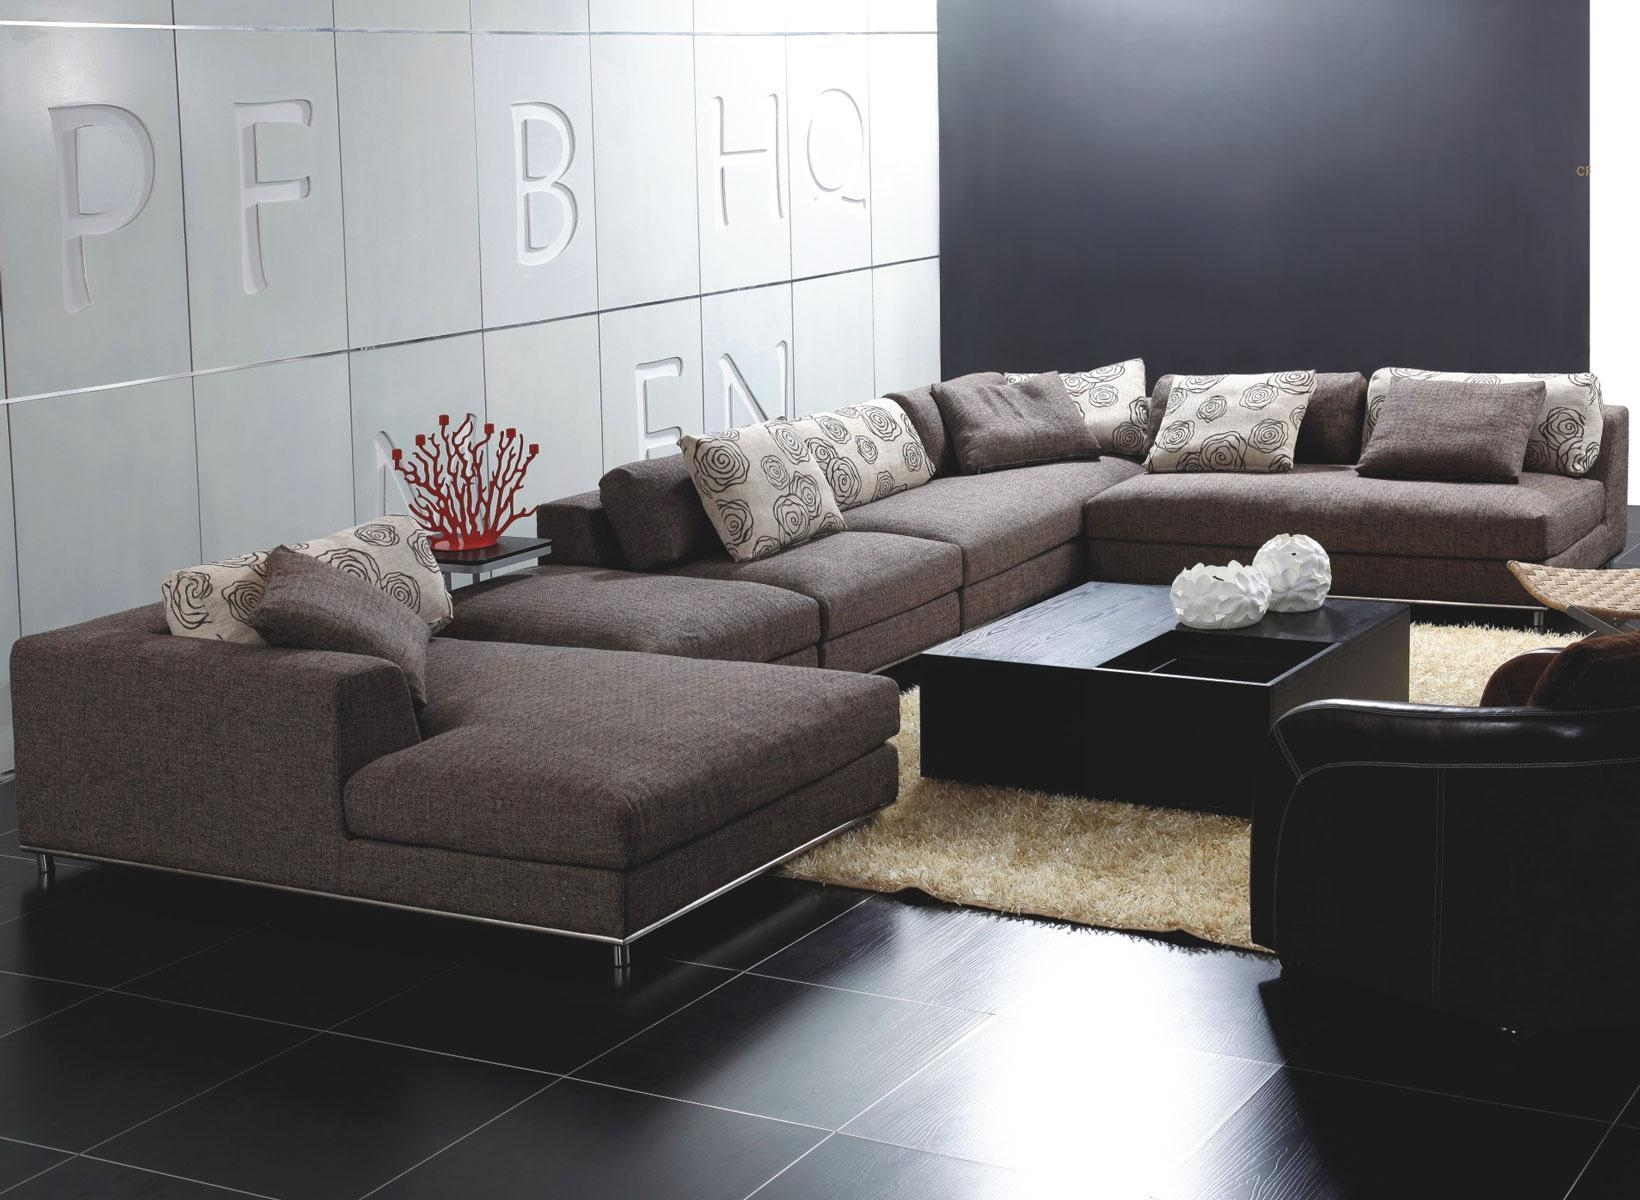 Contemporary Fabric Sectional Sofas #17314 For Contemporary Fabric Sofas (Image 5 of 20)